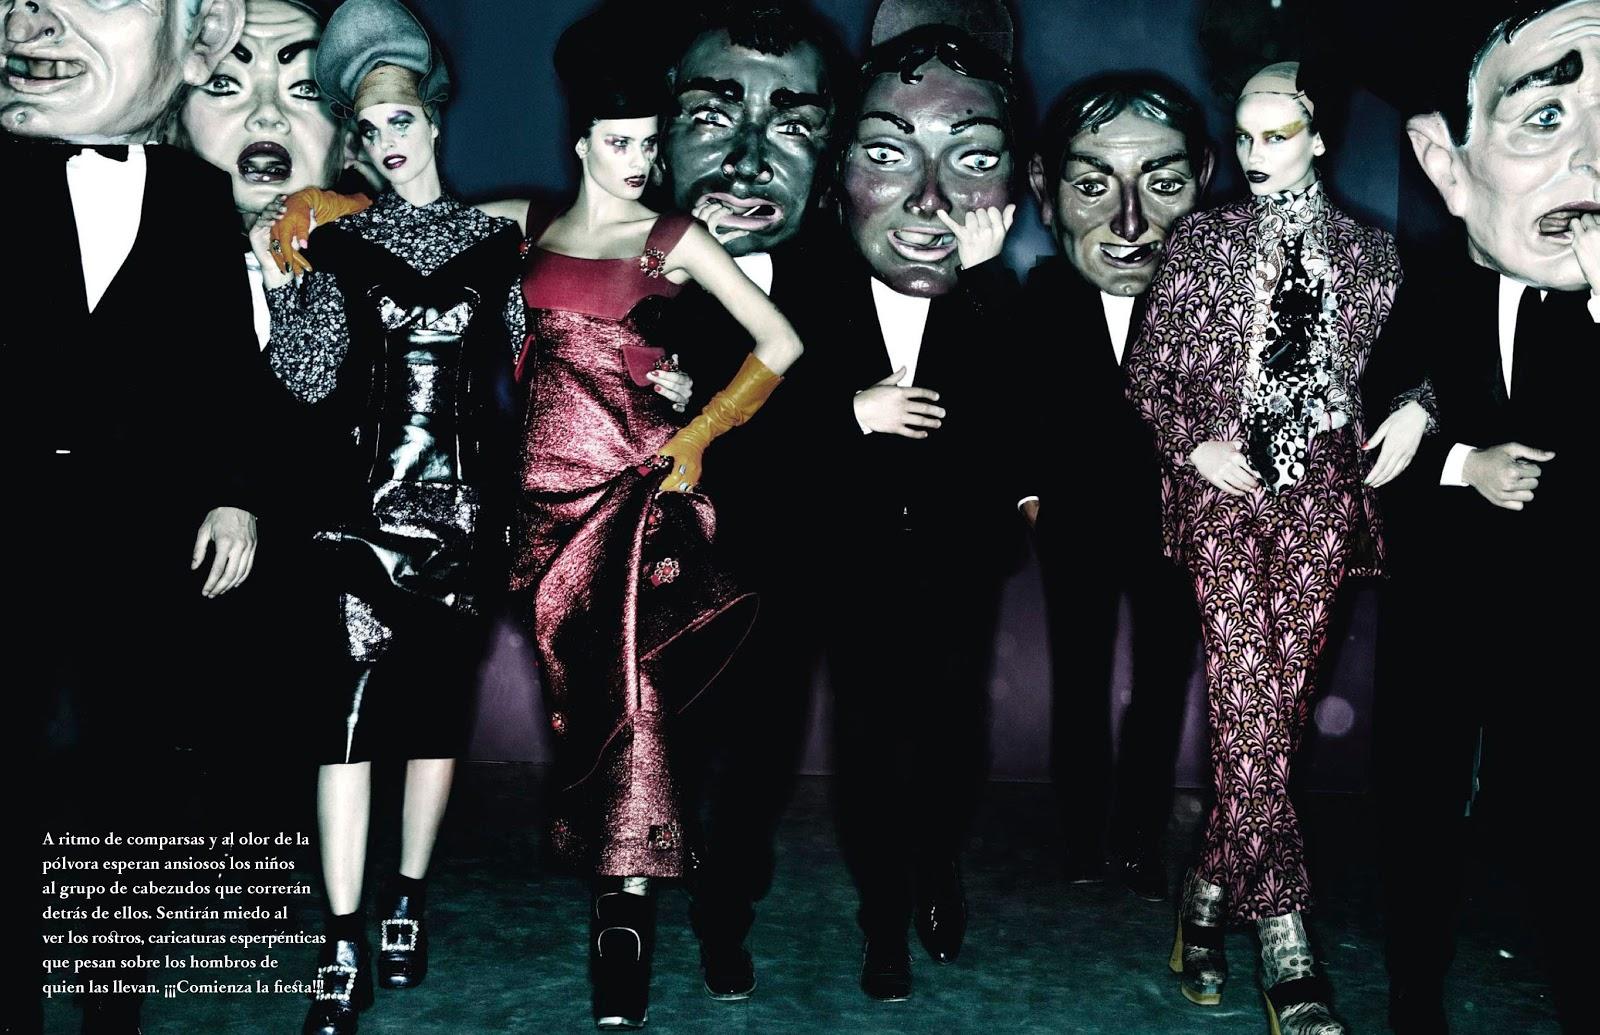 http://1.bp.blogspot.com/-SRxDgILgwuM/ULY5vXm2VBI/AAAAAAAAOh8/yrkbCBiQnXM/s1600/Vogue+Spain+Dec+2012+Testino+VO31.jpg